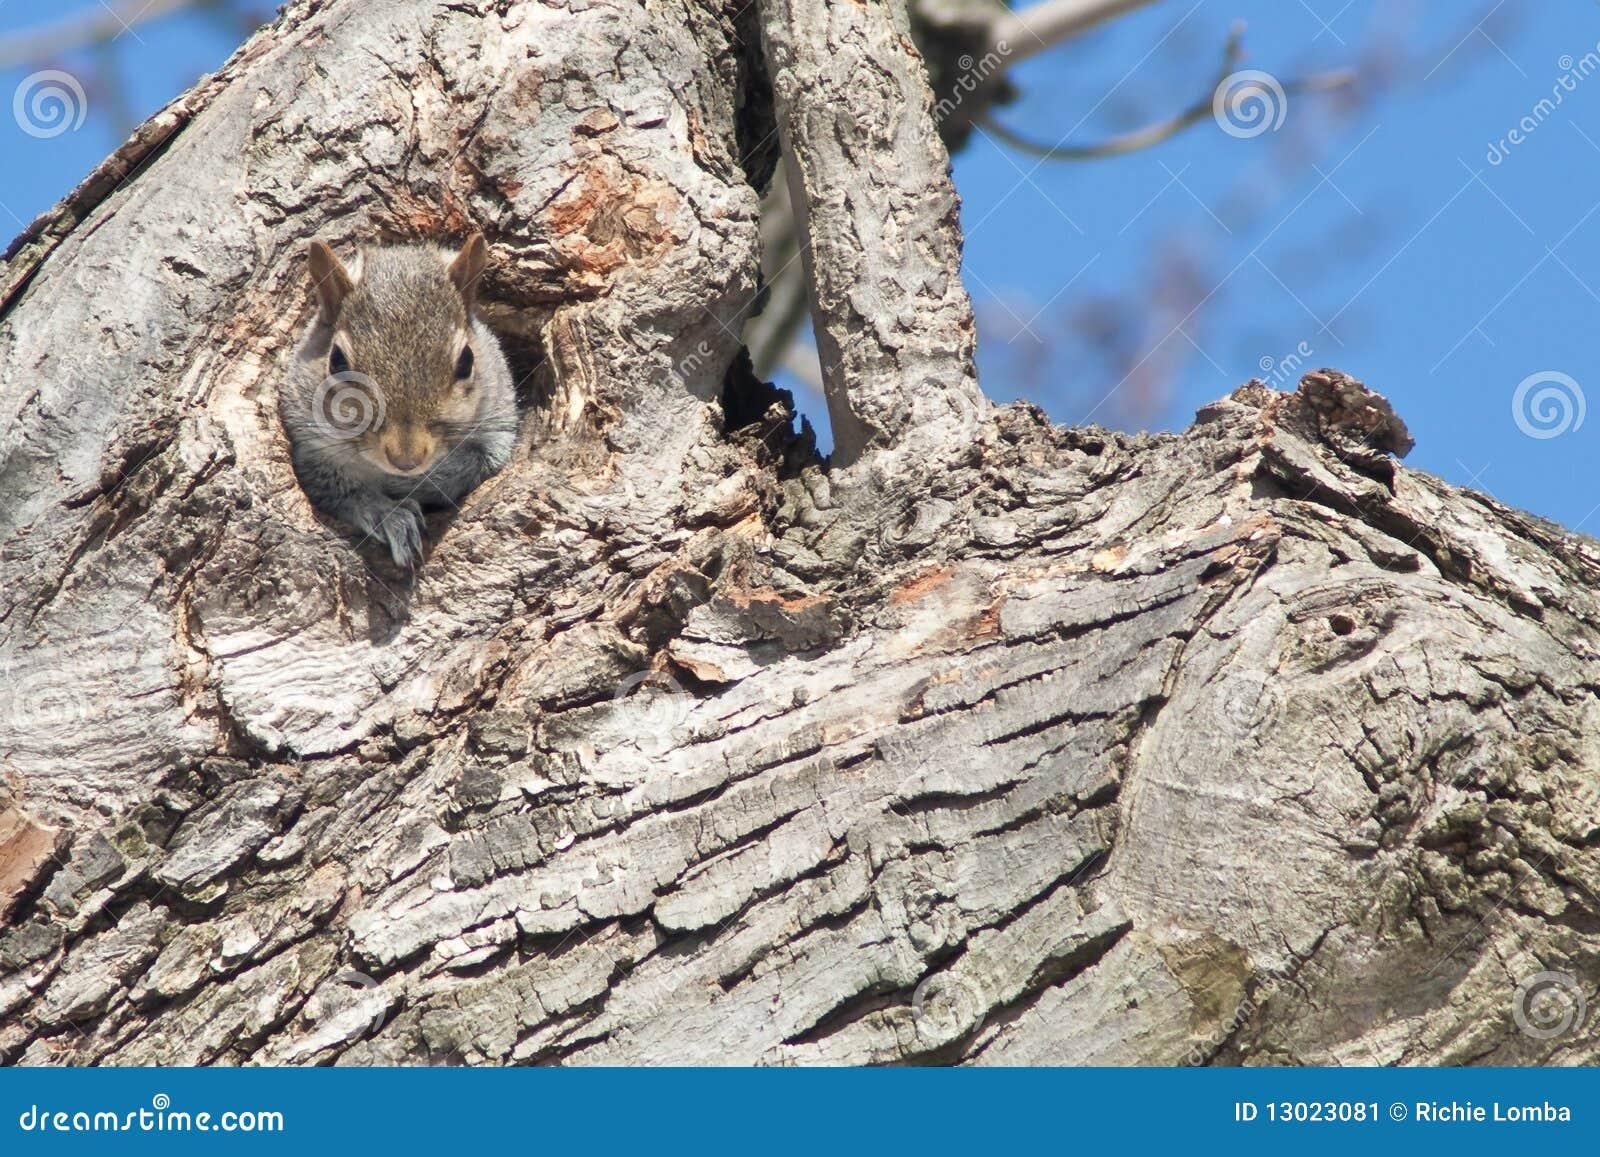 Grey squirrel in tree trunk